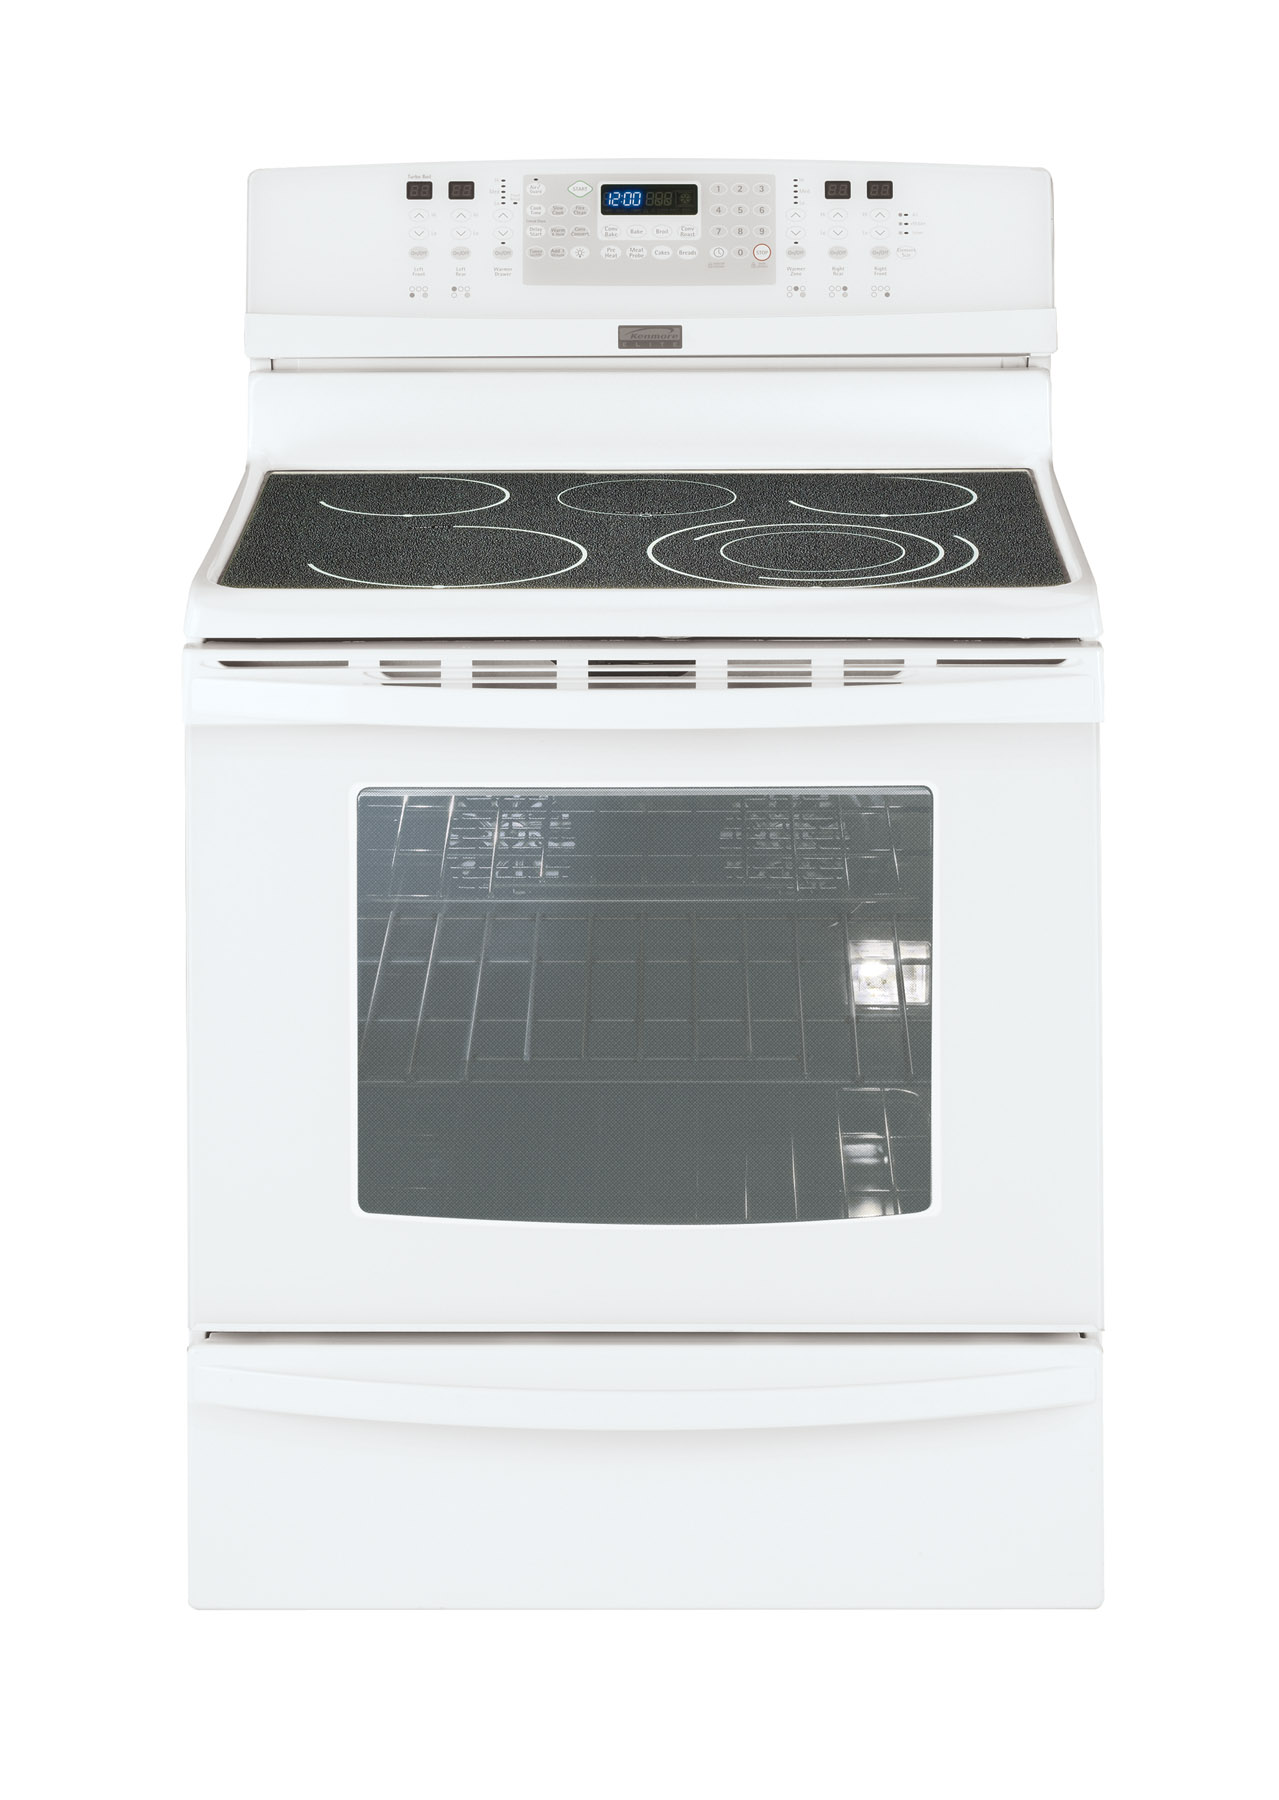 Kenmore Range/Stove/Oven Model 790.97472802 Parts